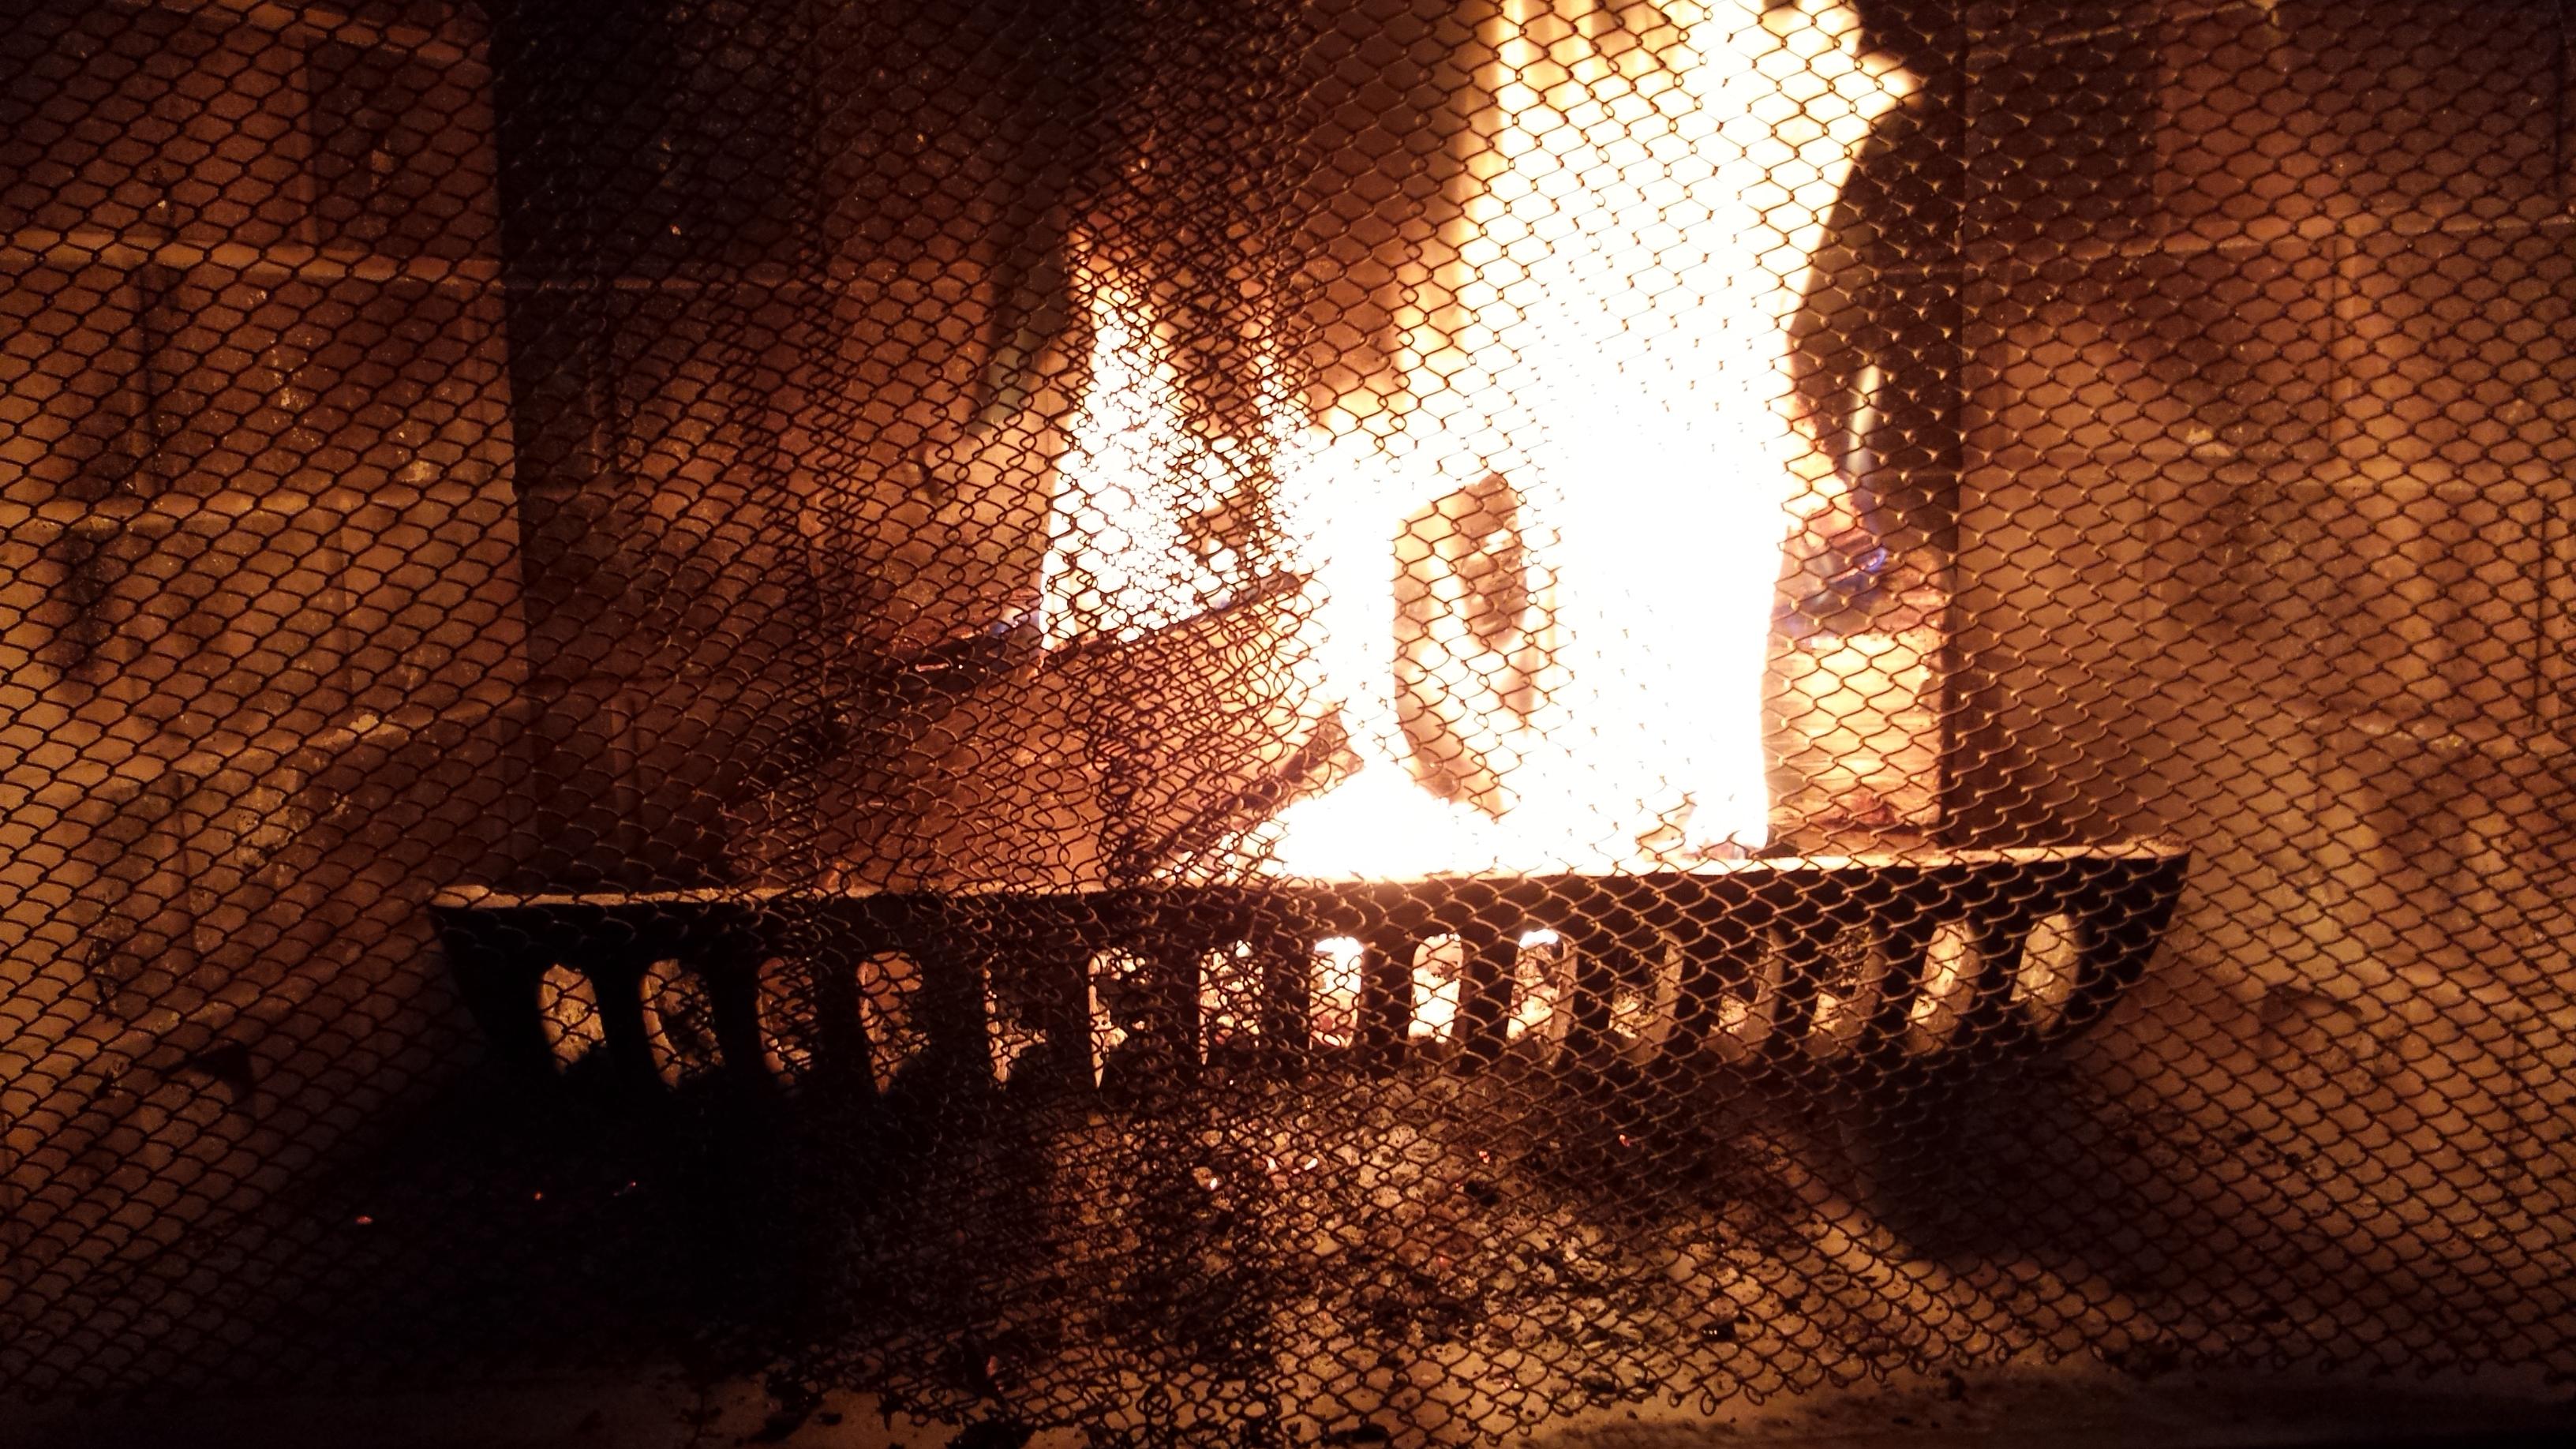 free stock photo of fire fireplace firewood